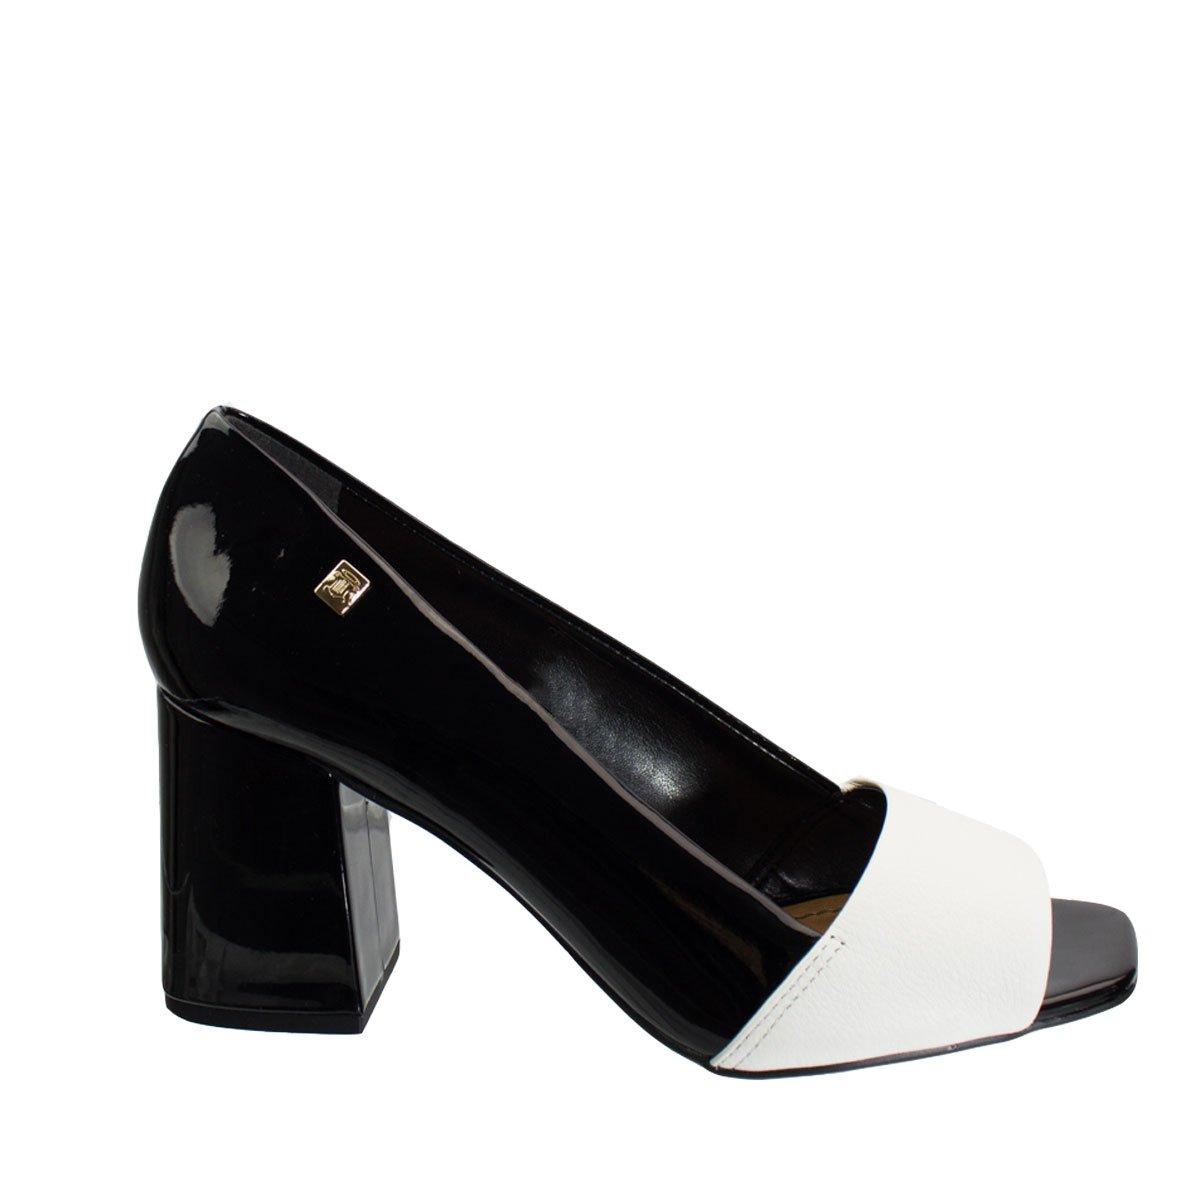 812c32bc32 Bizz Store - Sapato Peep Toe Feminino Loucos e Santos Snake